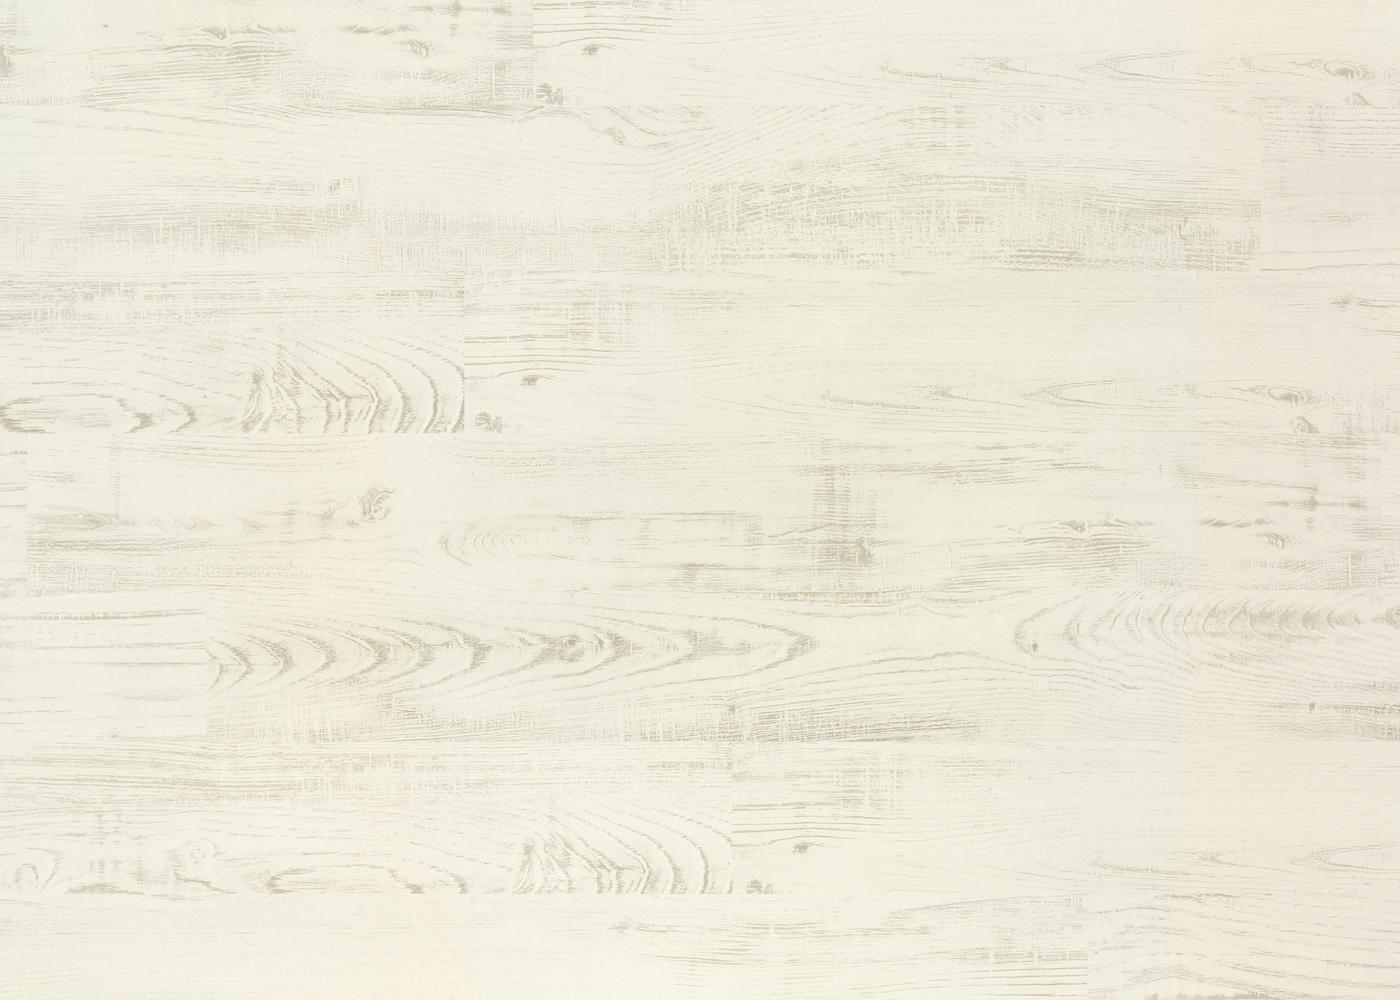 Sol stratifié Châtaignier Blanc Bâton rompu - Château 8 G4 - 8x84x504